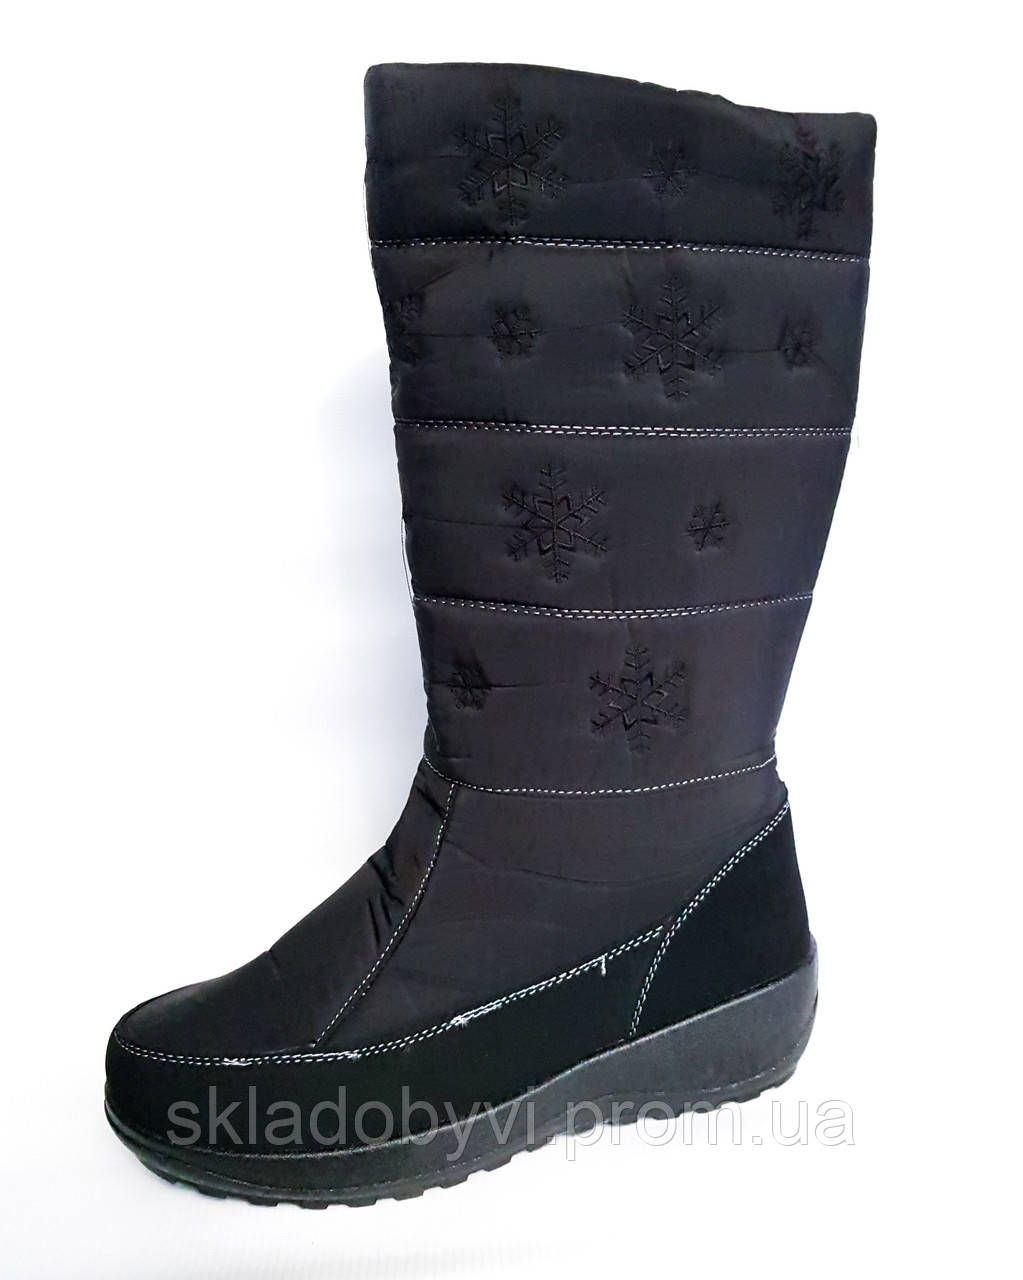 Женские дутики сапоги аляска